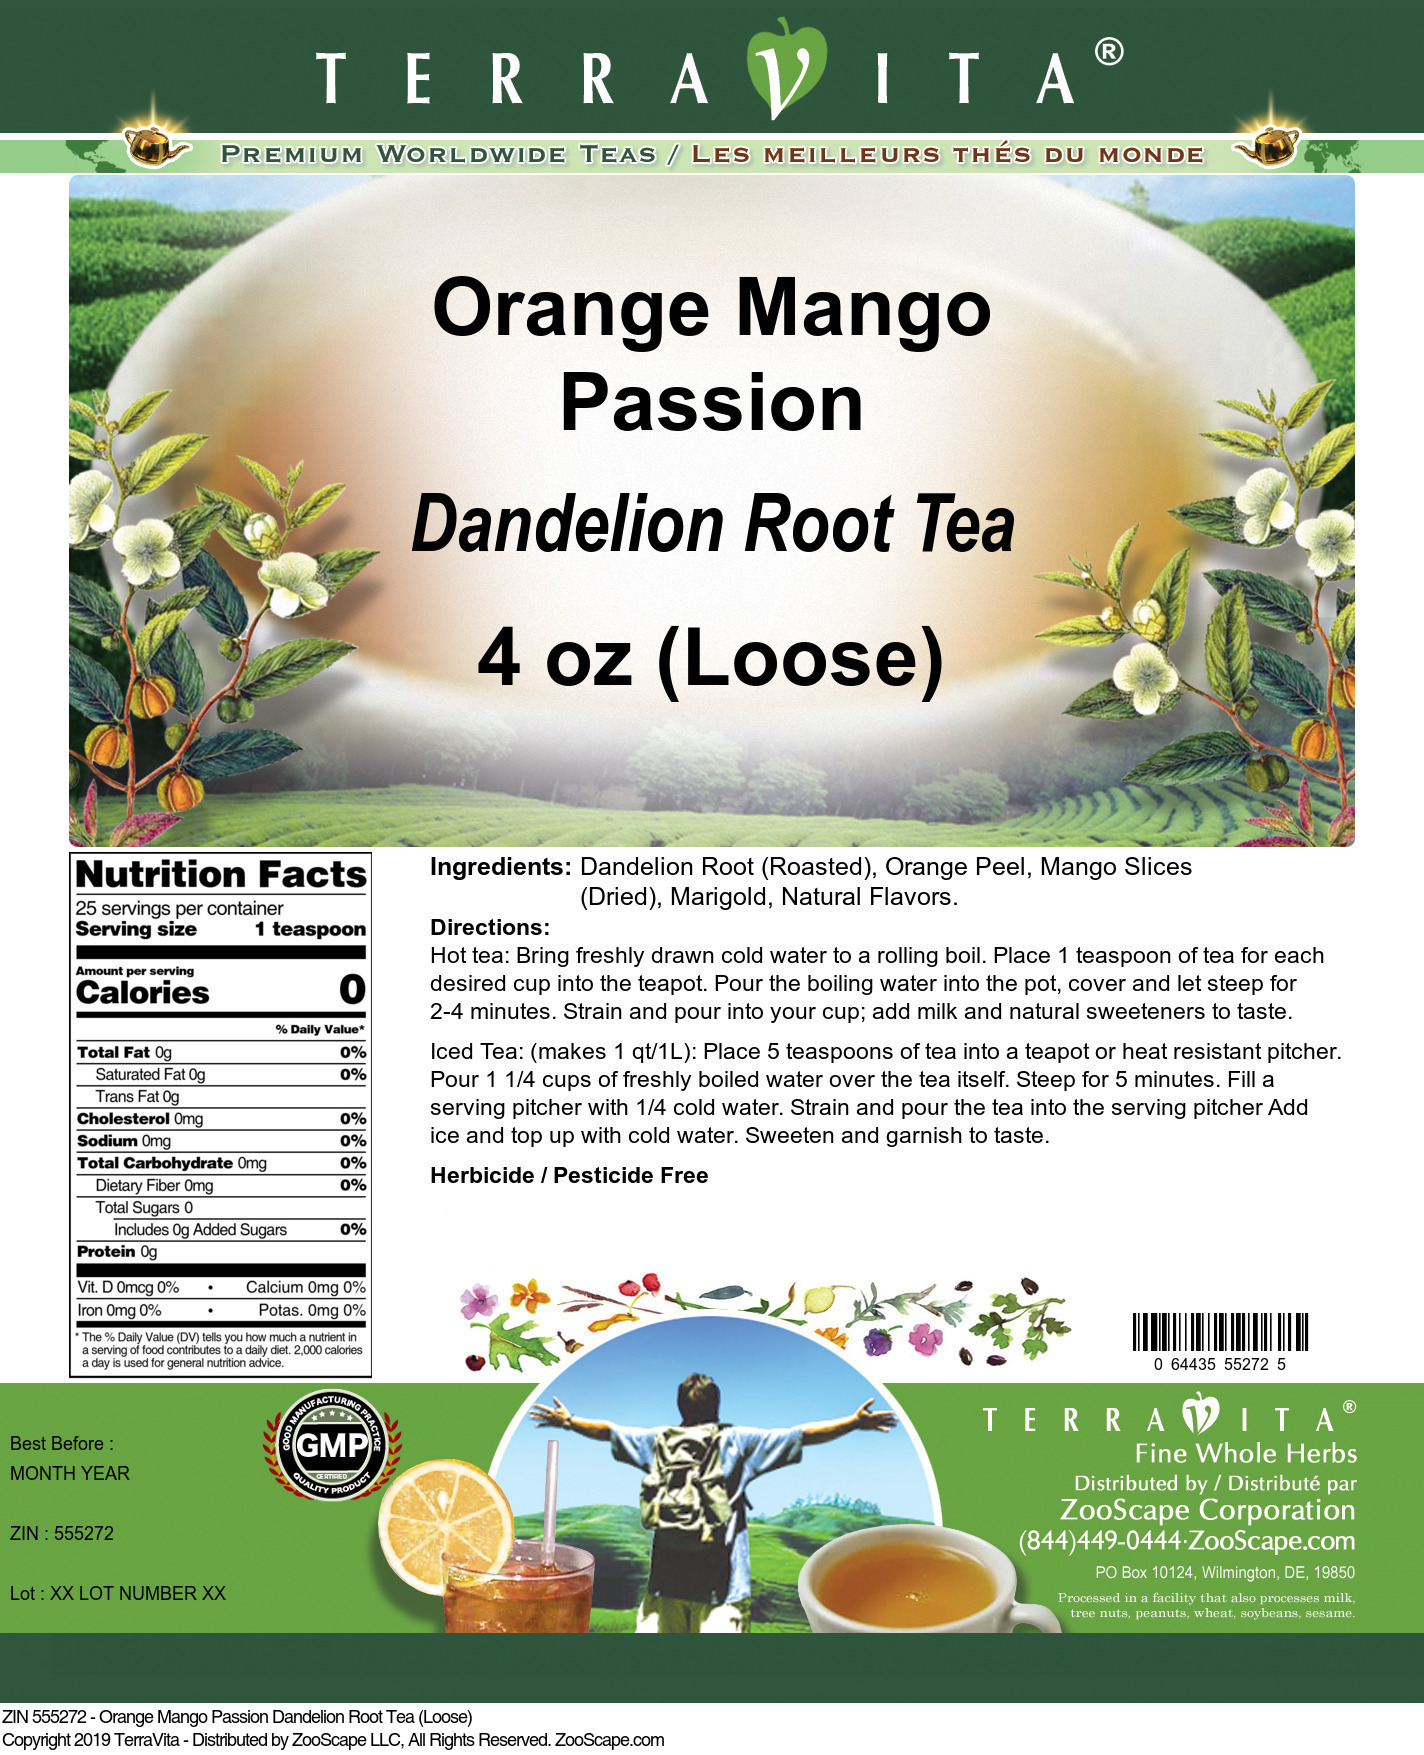 Orange Mango Passion Dandelion Root Tea (Loose)